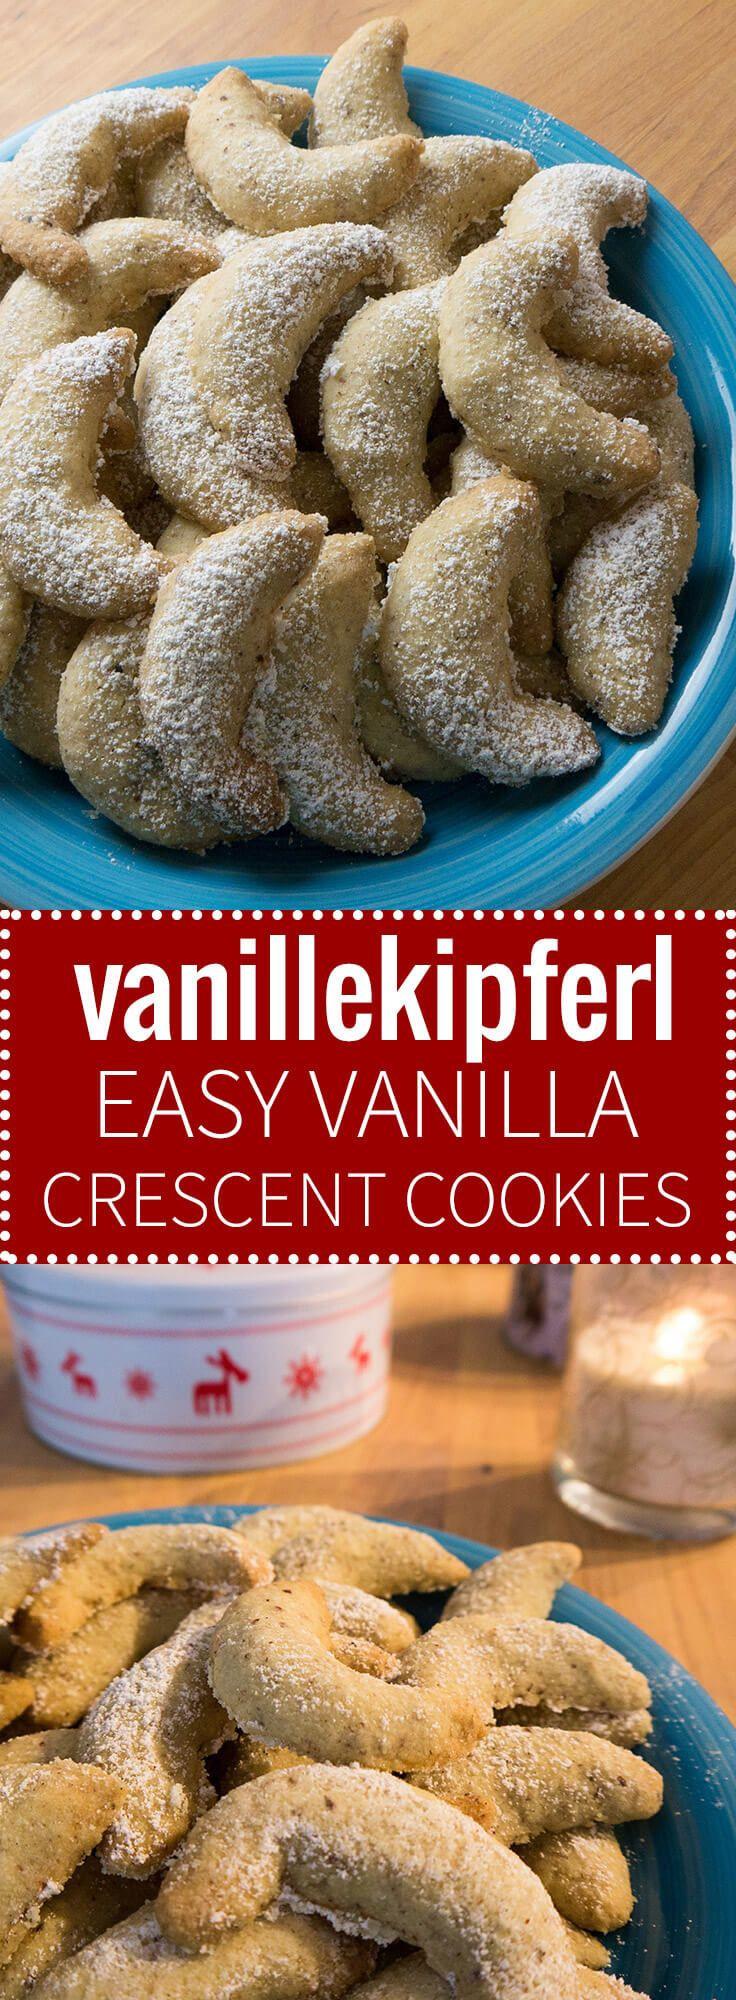 Traditional German Christmas Desserts  Vanillekipferl German Vanilla Crescent Cookies are